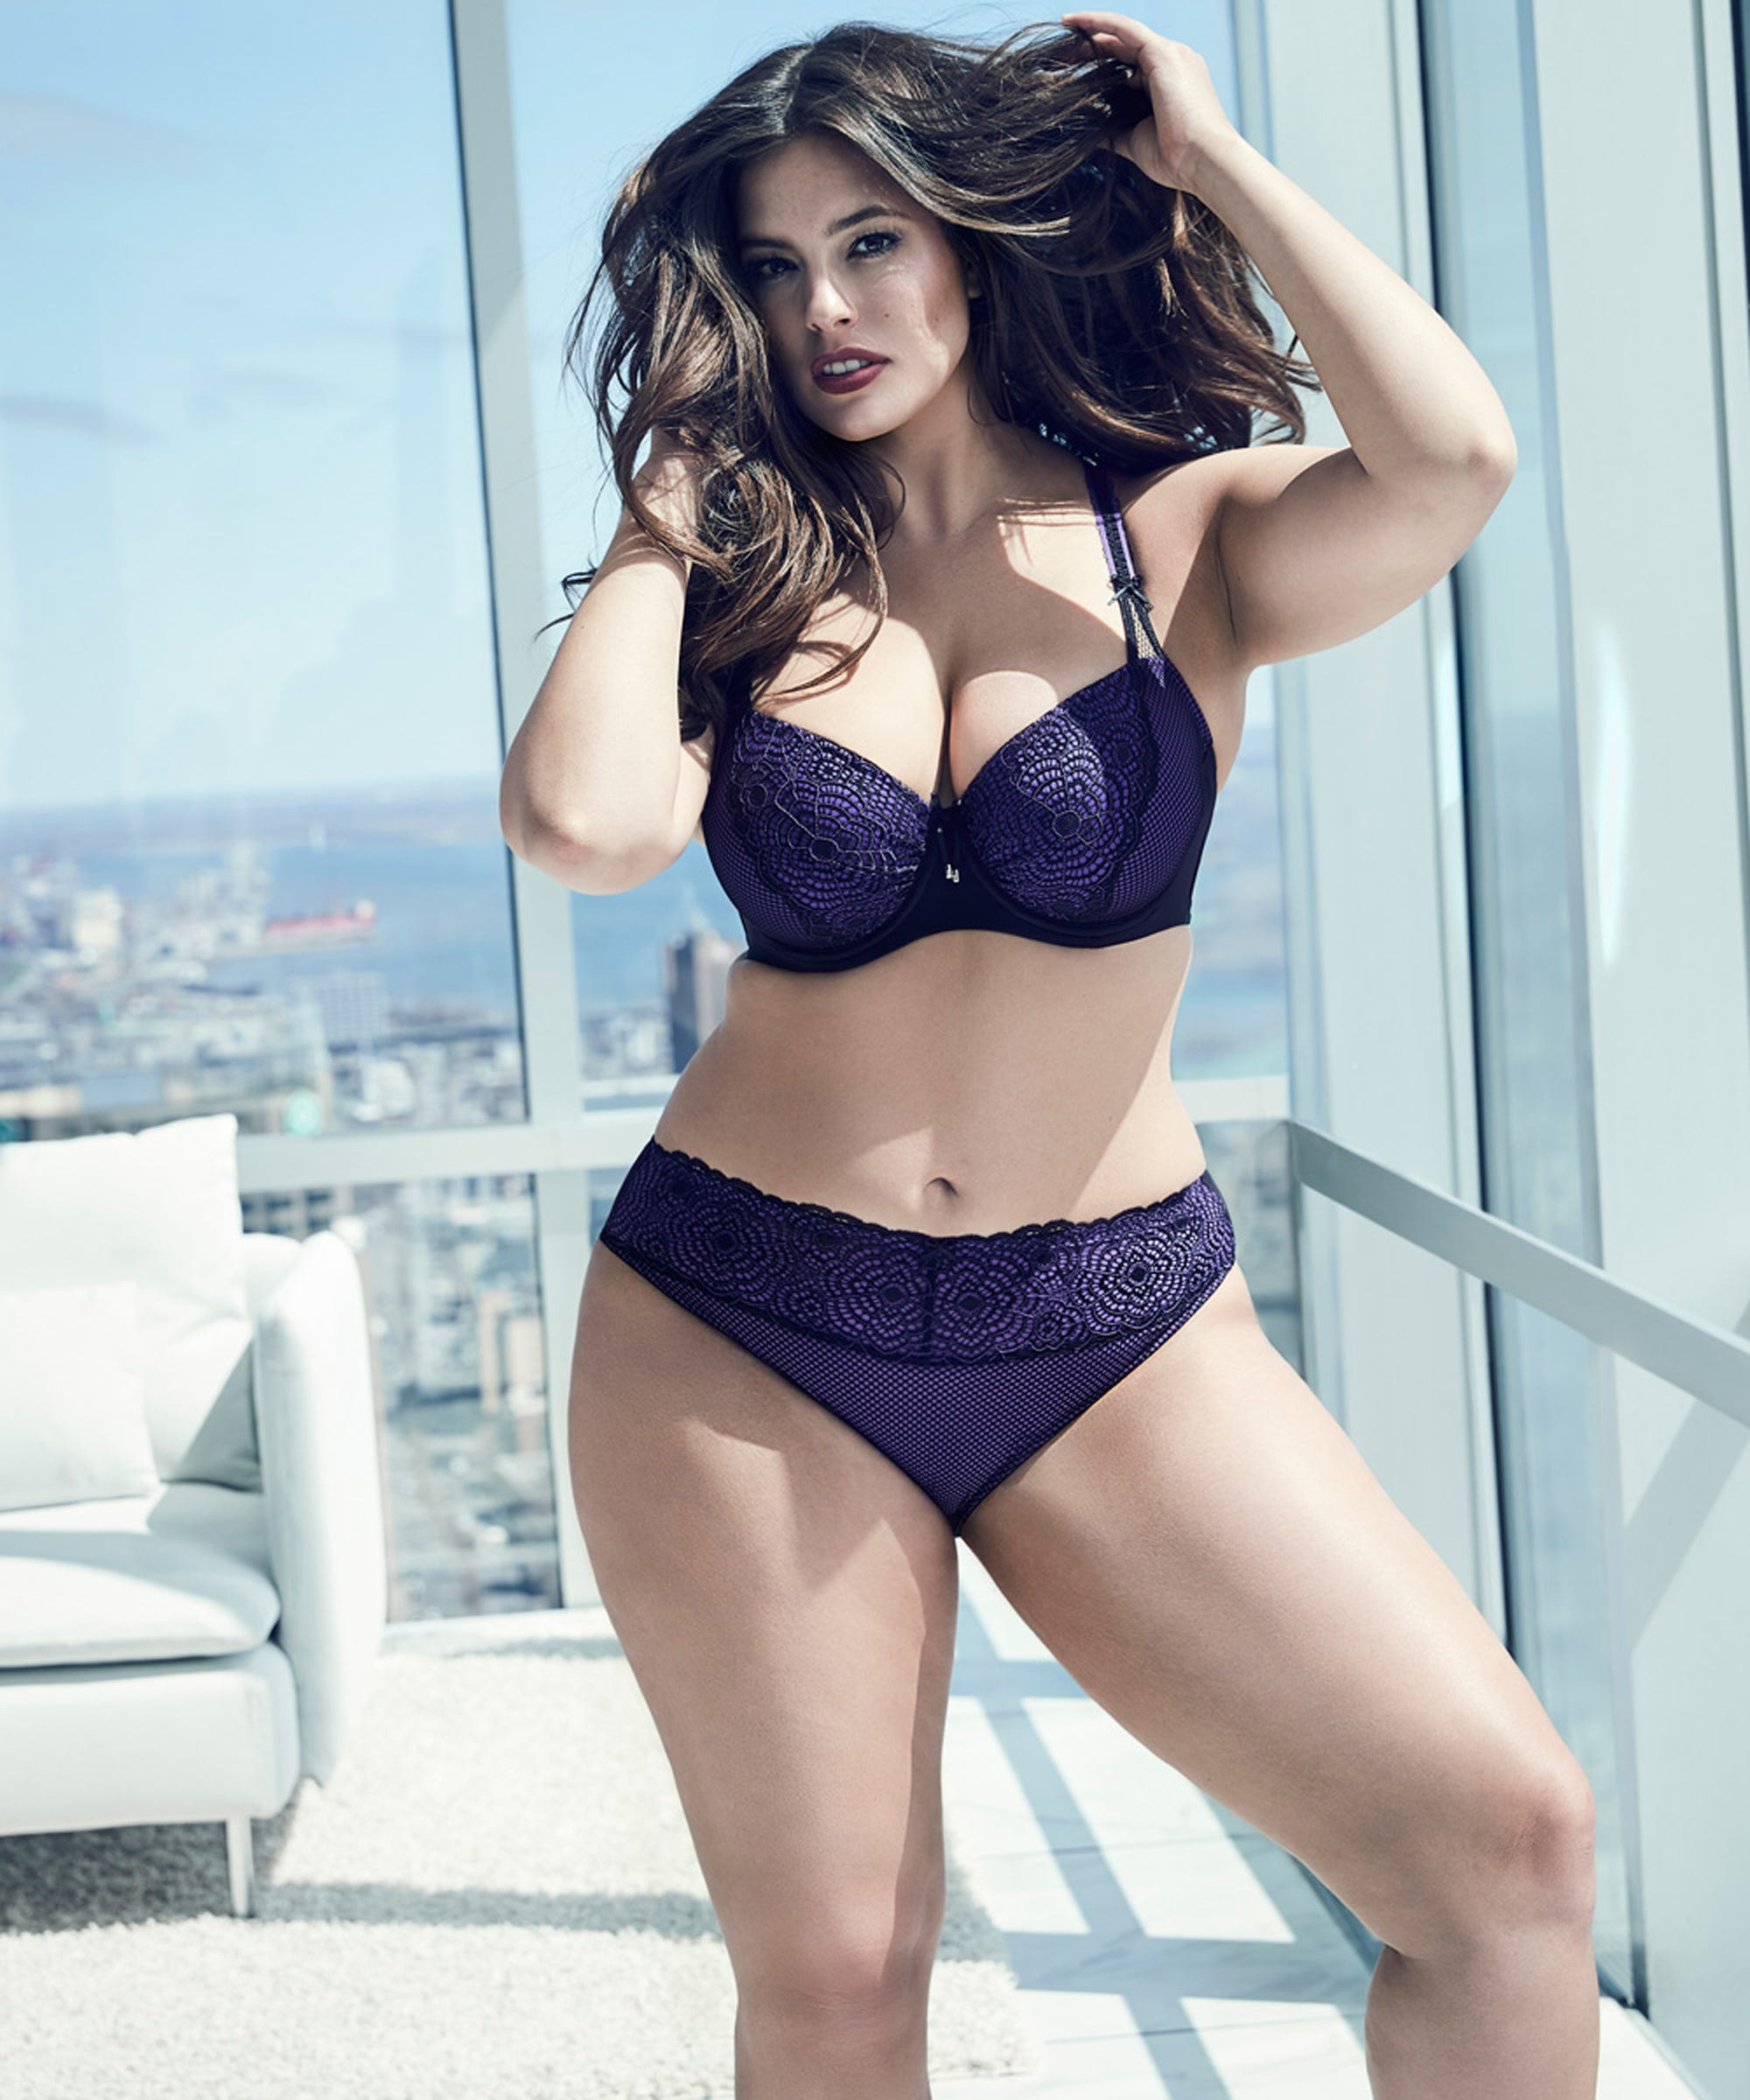 Ashley Graham Plus Size Diva Bra with Web Lace